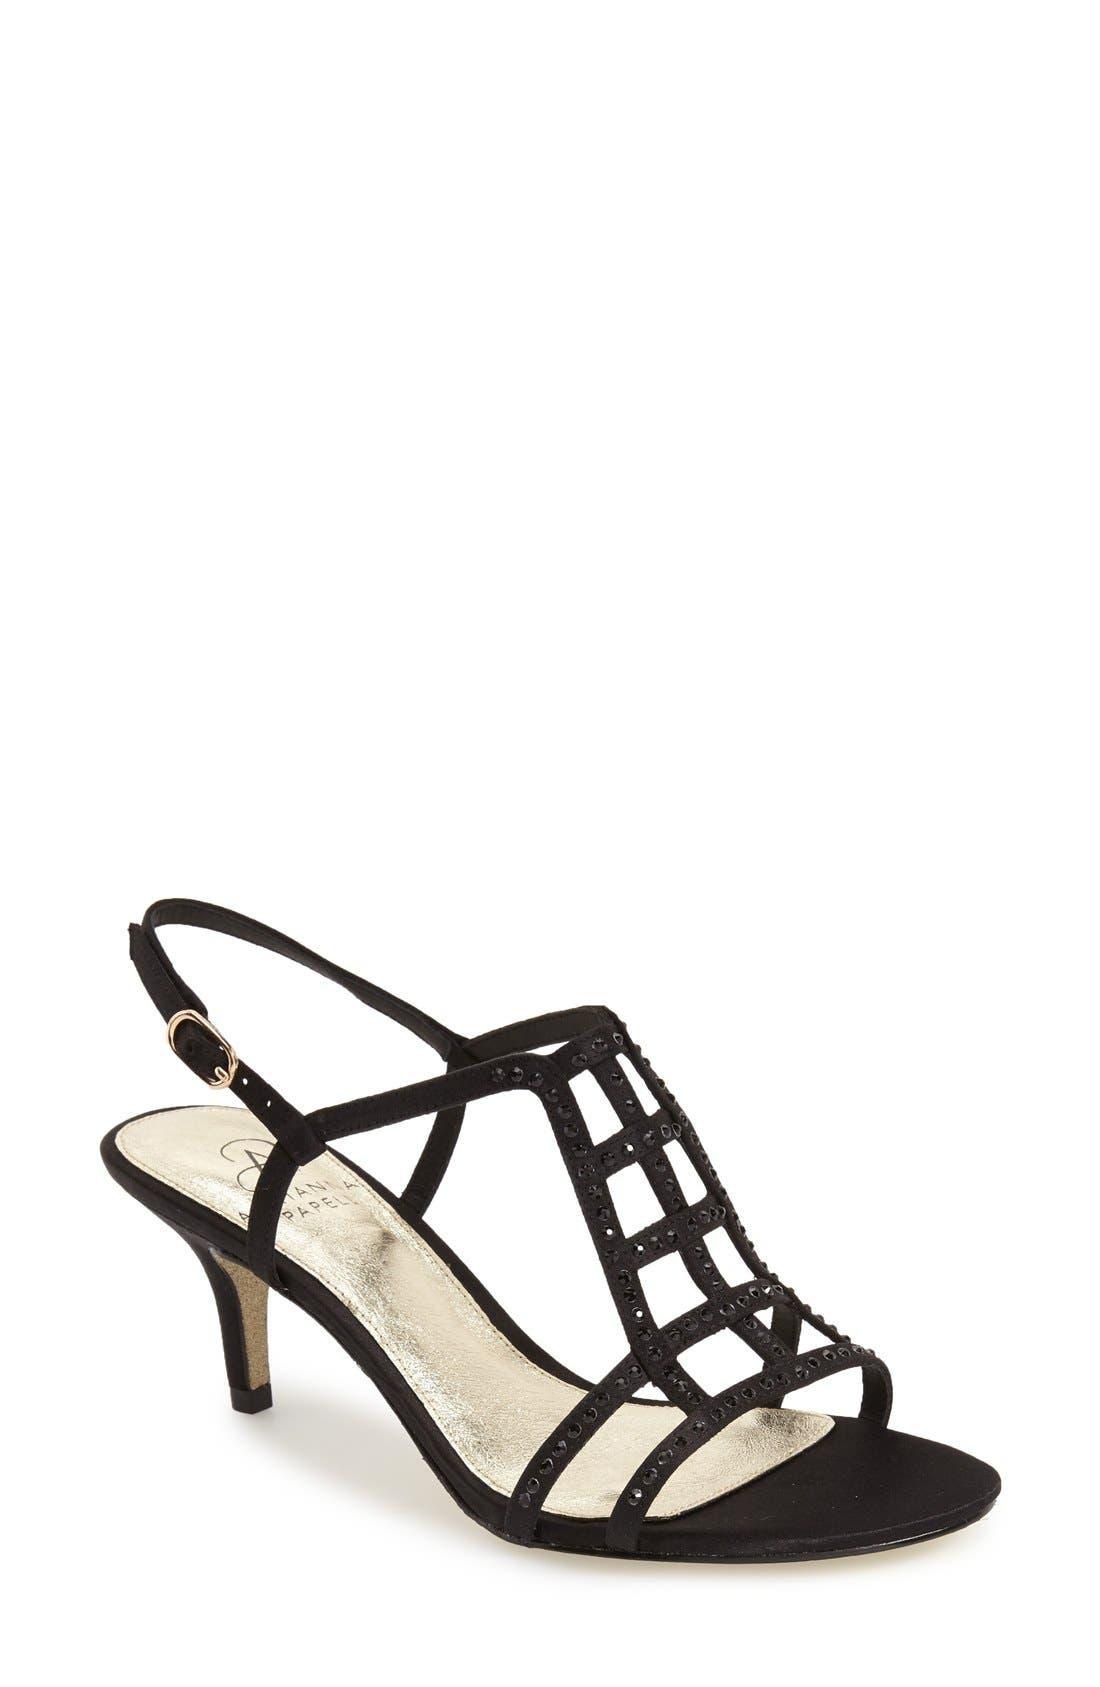 ADRIANNA PAPELL 'Amari' Evening Sandal